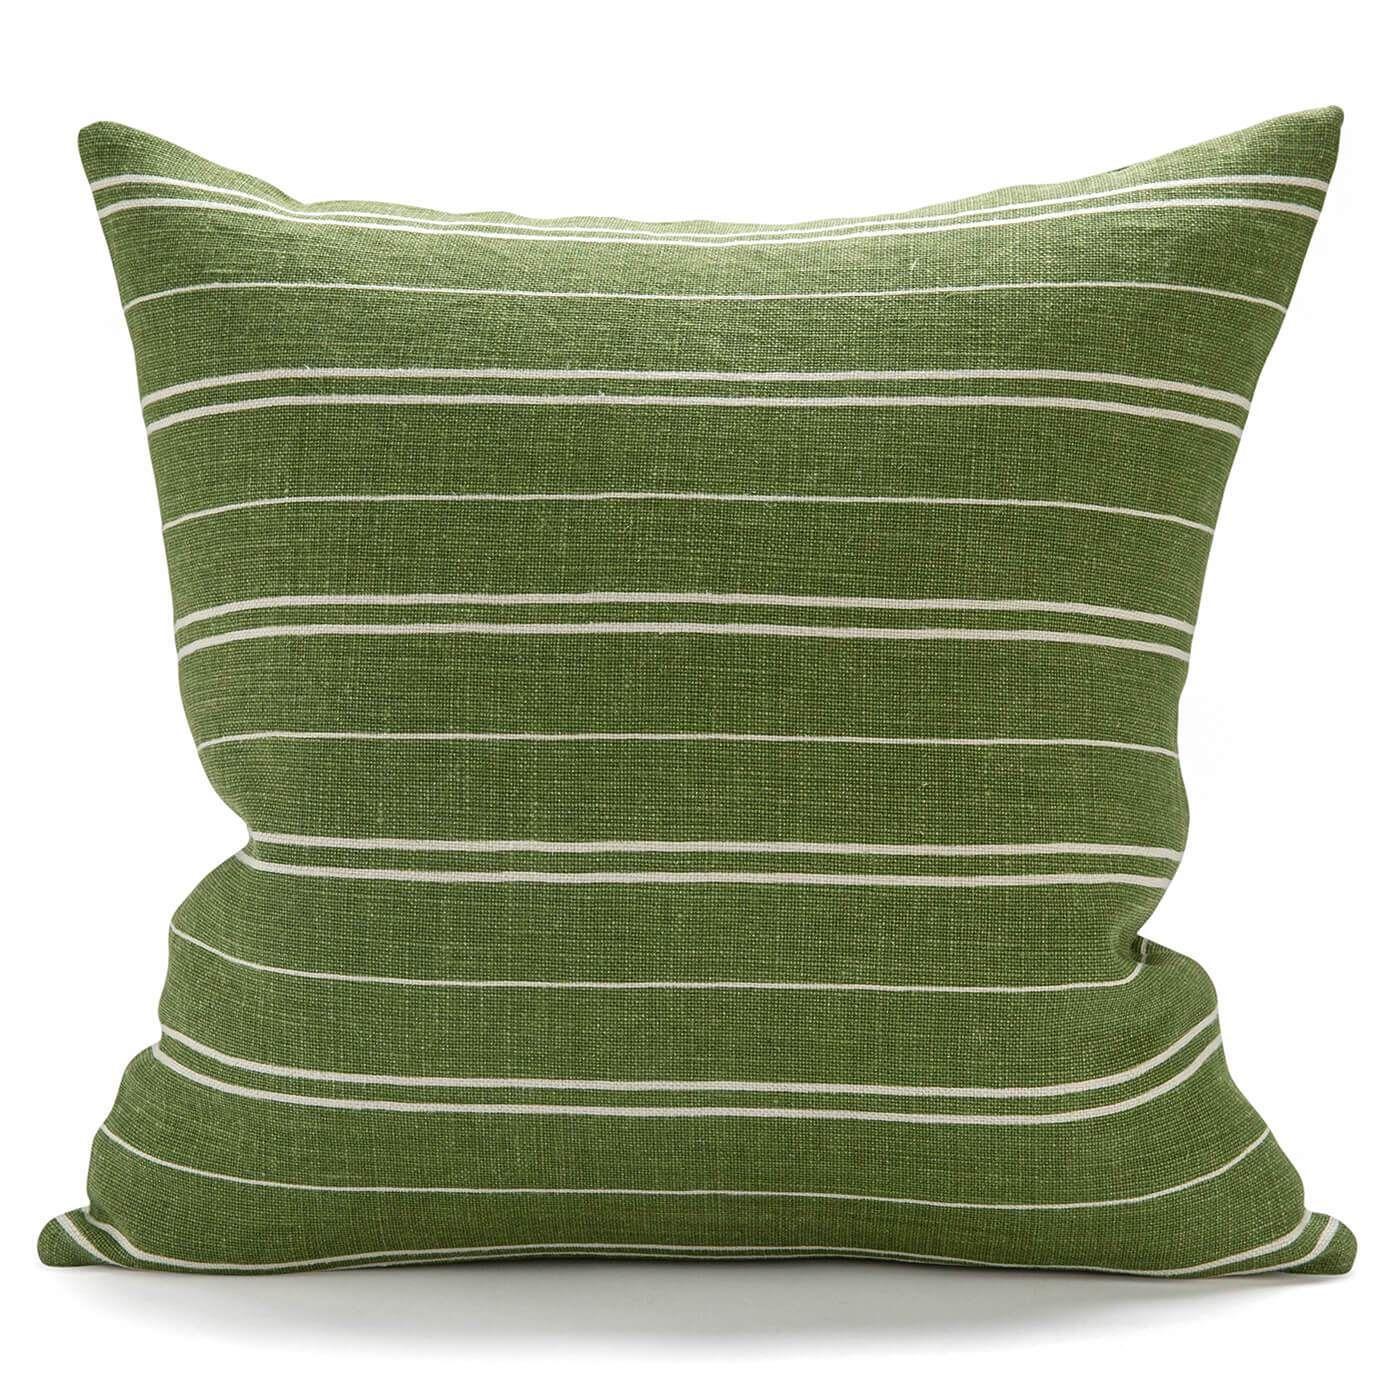 The Pillow Collection Adelheid Geometric Throw Pillow Cover Throw Pillow Covers Home Kitchen